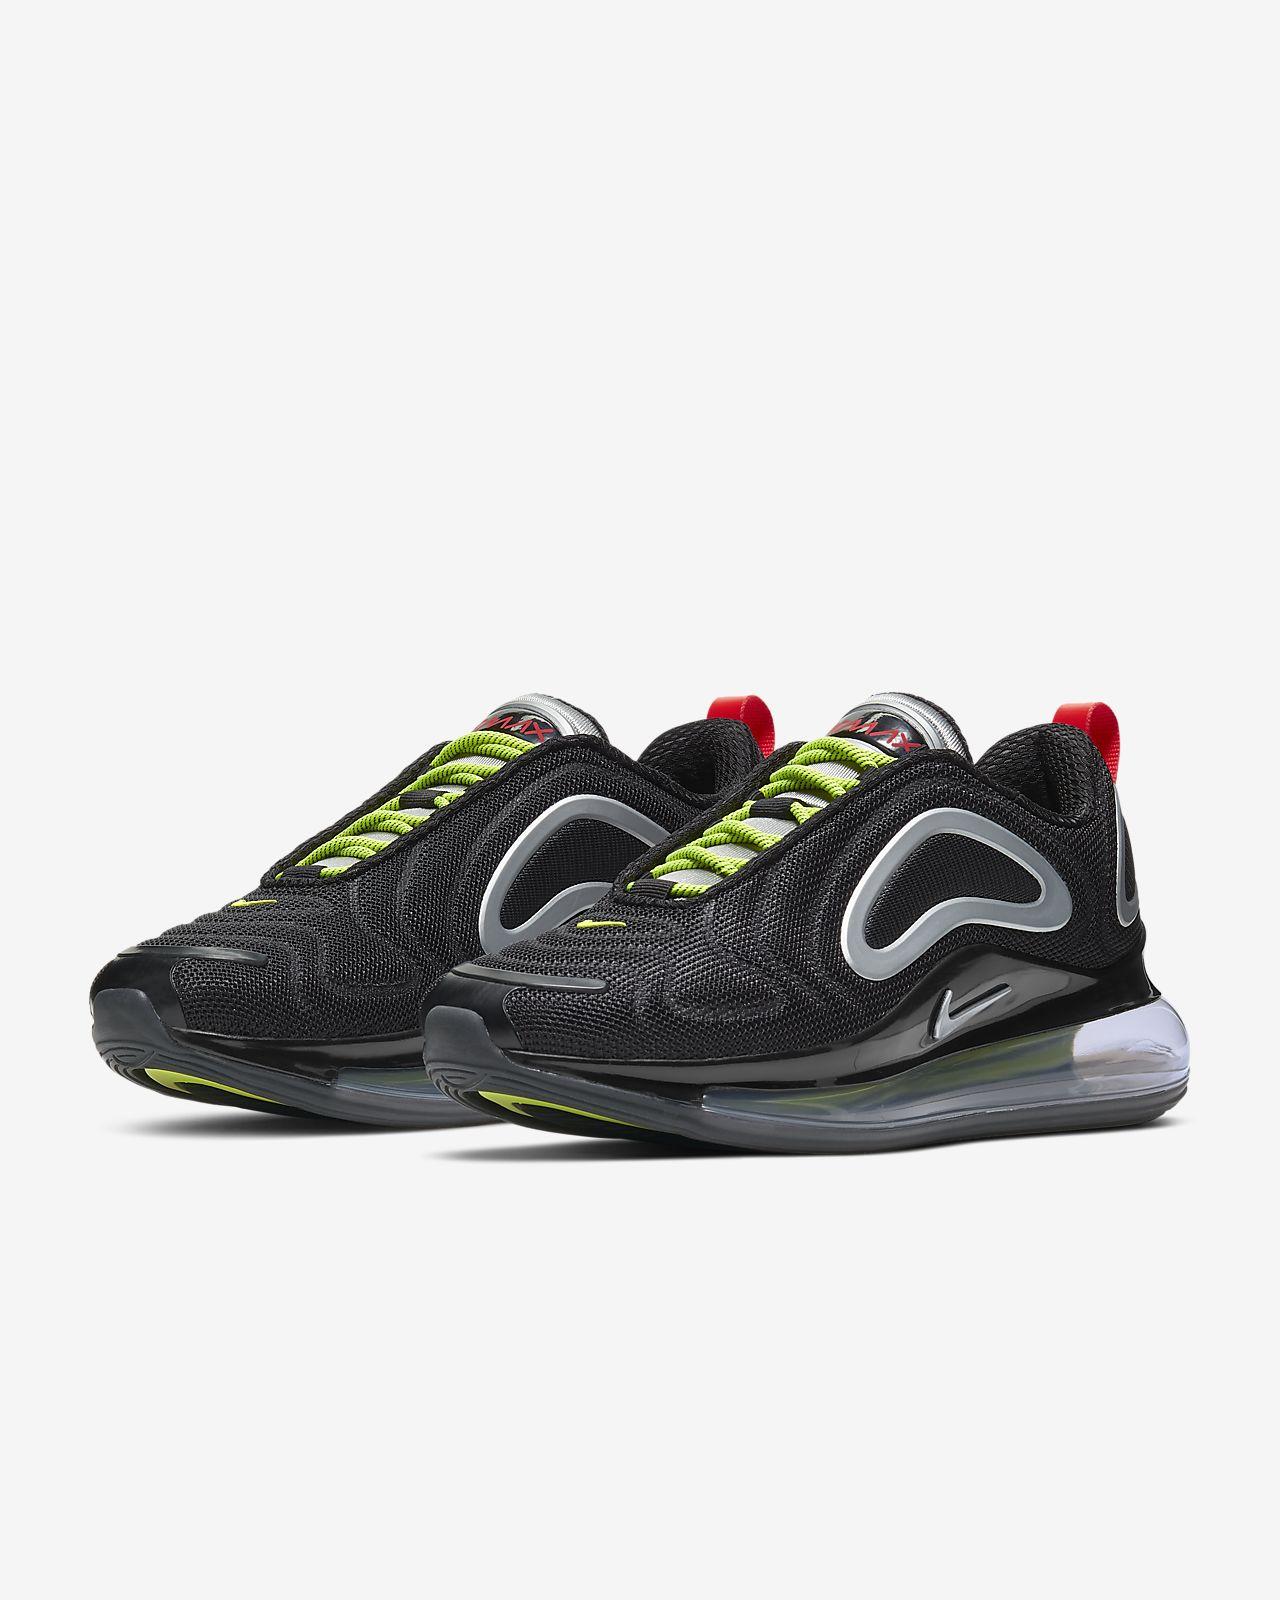 Sapatilhas Nike Air Max 720 para mulher